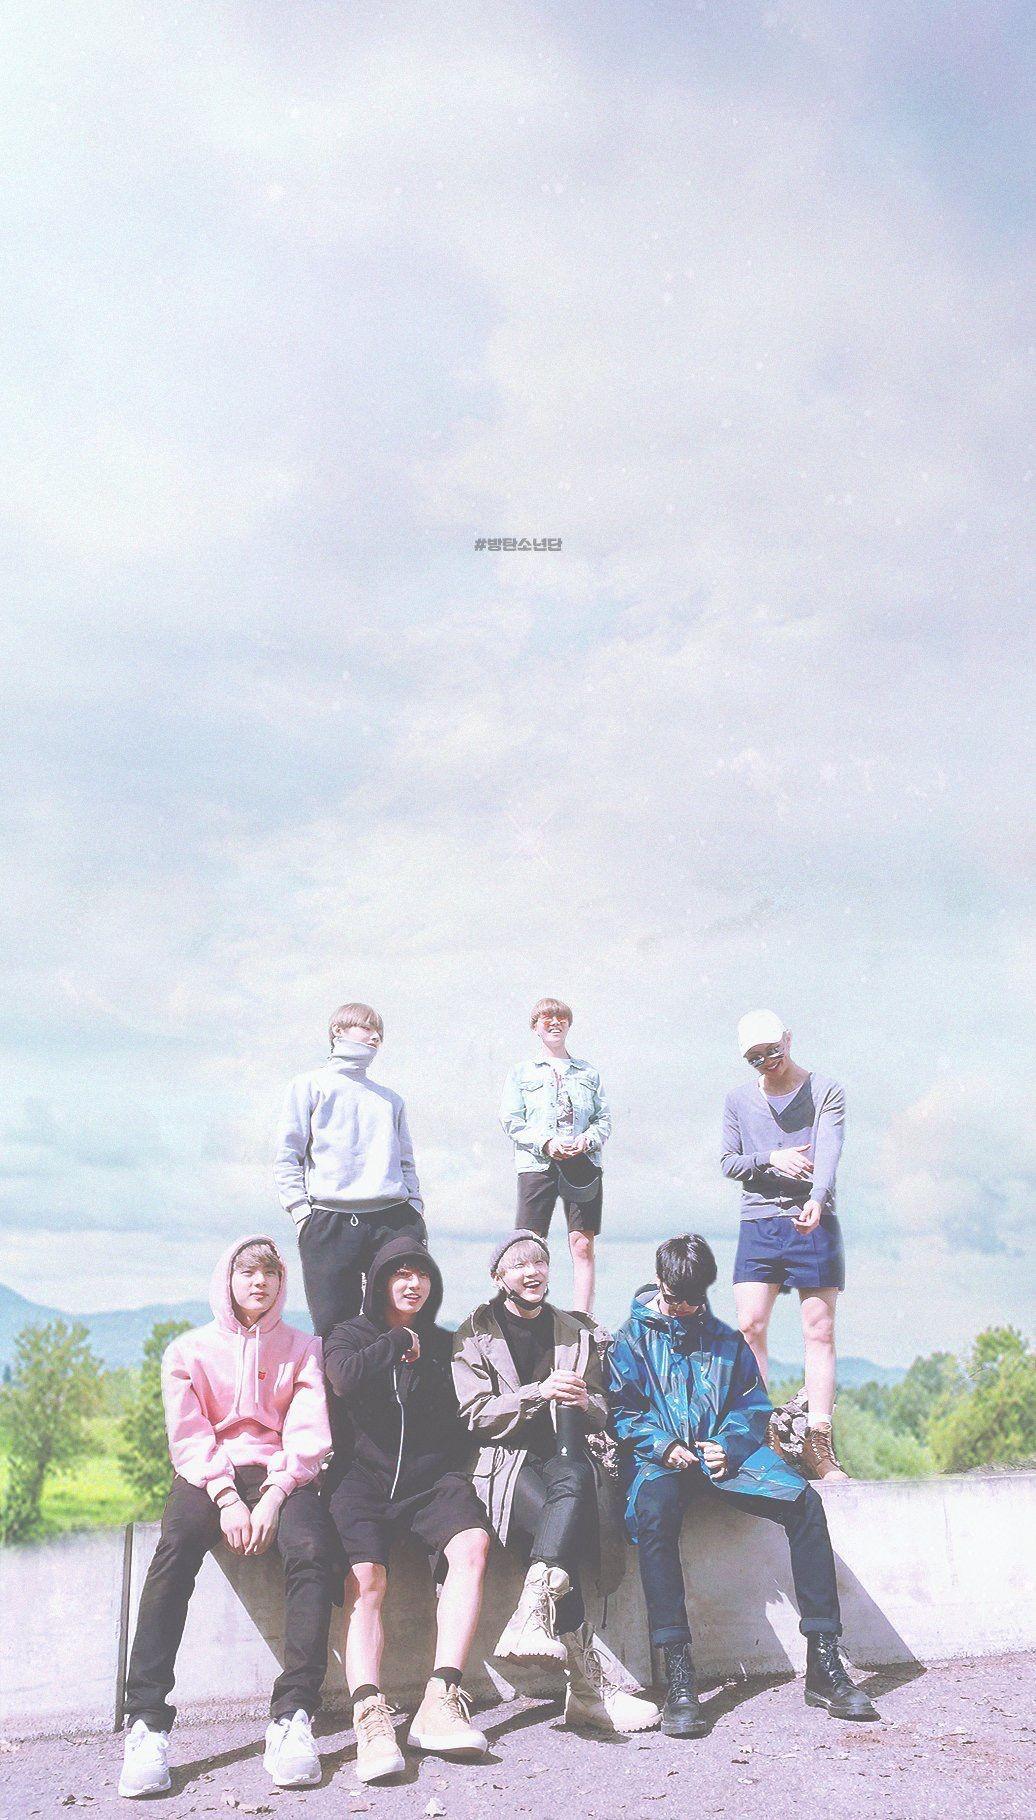 Free download BTS Aesthetic Wallpapers Top BTS Aesthetic